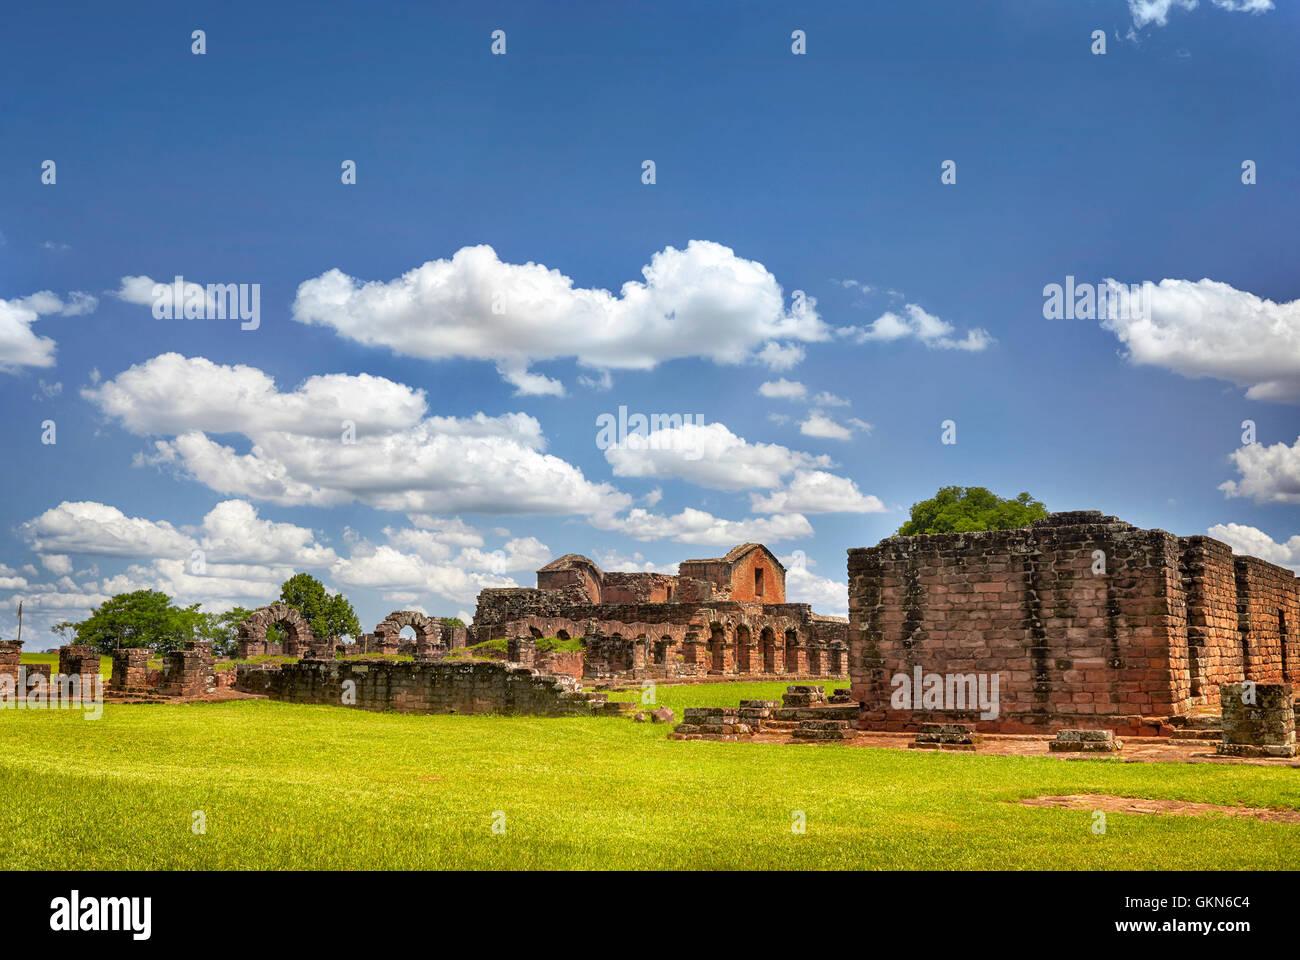 Ruins of the Jesuit Guarani reduction La Santisima Trinidad de Parana, UNESCO World Heritage Site, Paraguay, South - Stock Image